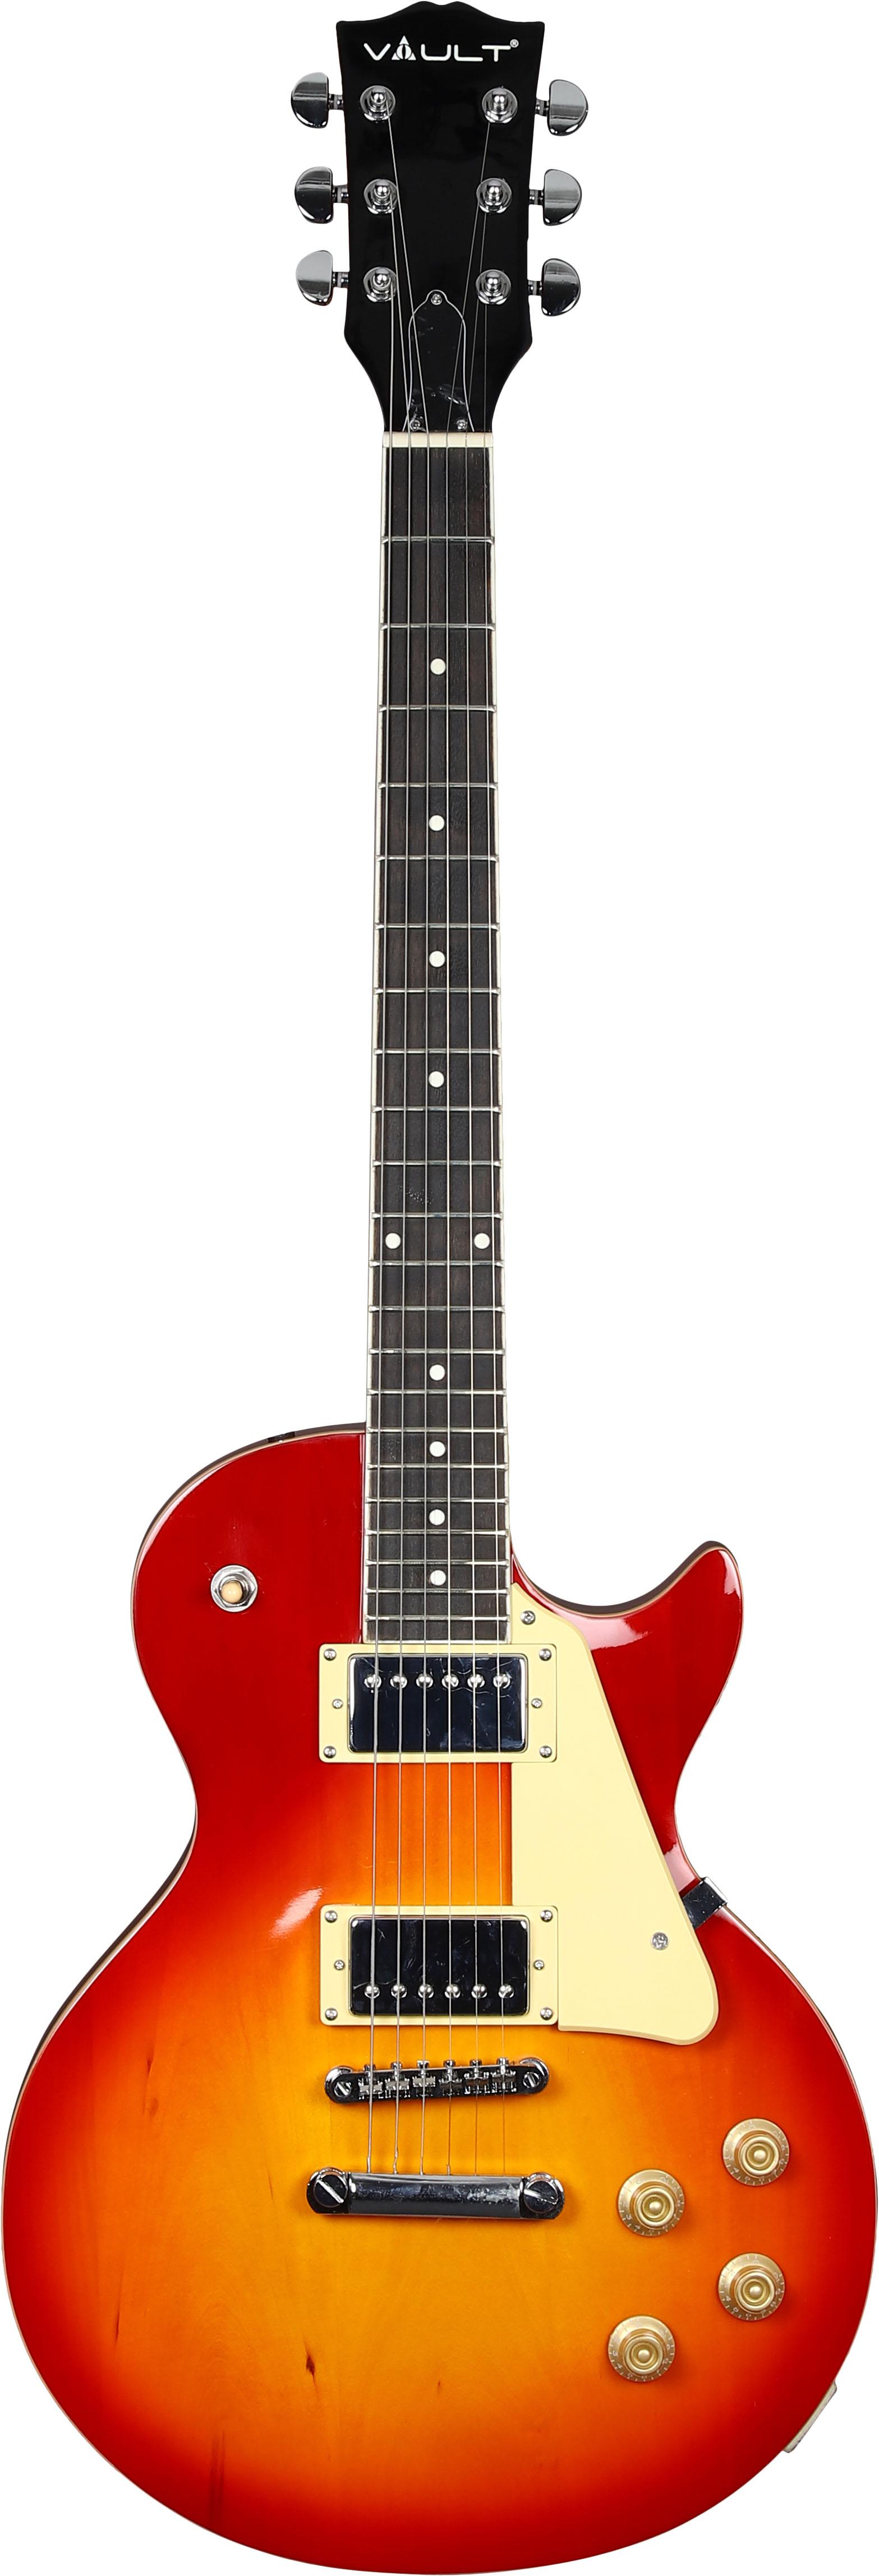 Vault-LP1-Ovangkol-Fretboard-Electric-Guitar-Cherry-Red-Burst-w-Amplifier thumbnail 2